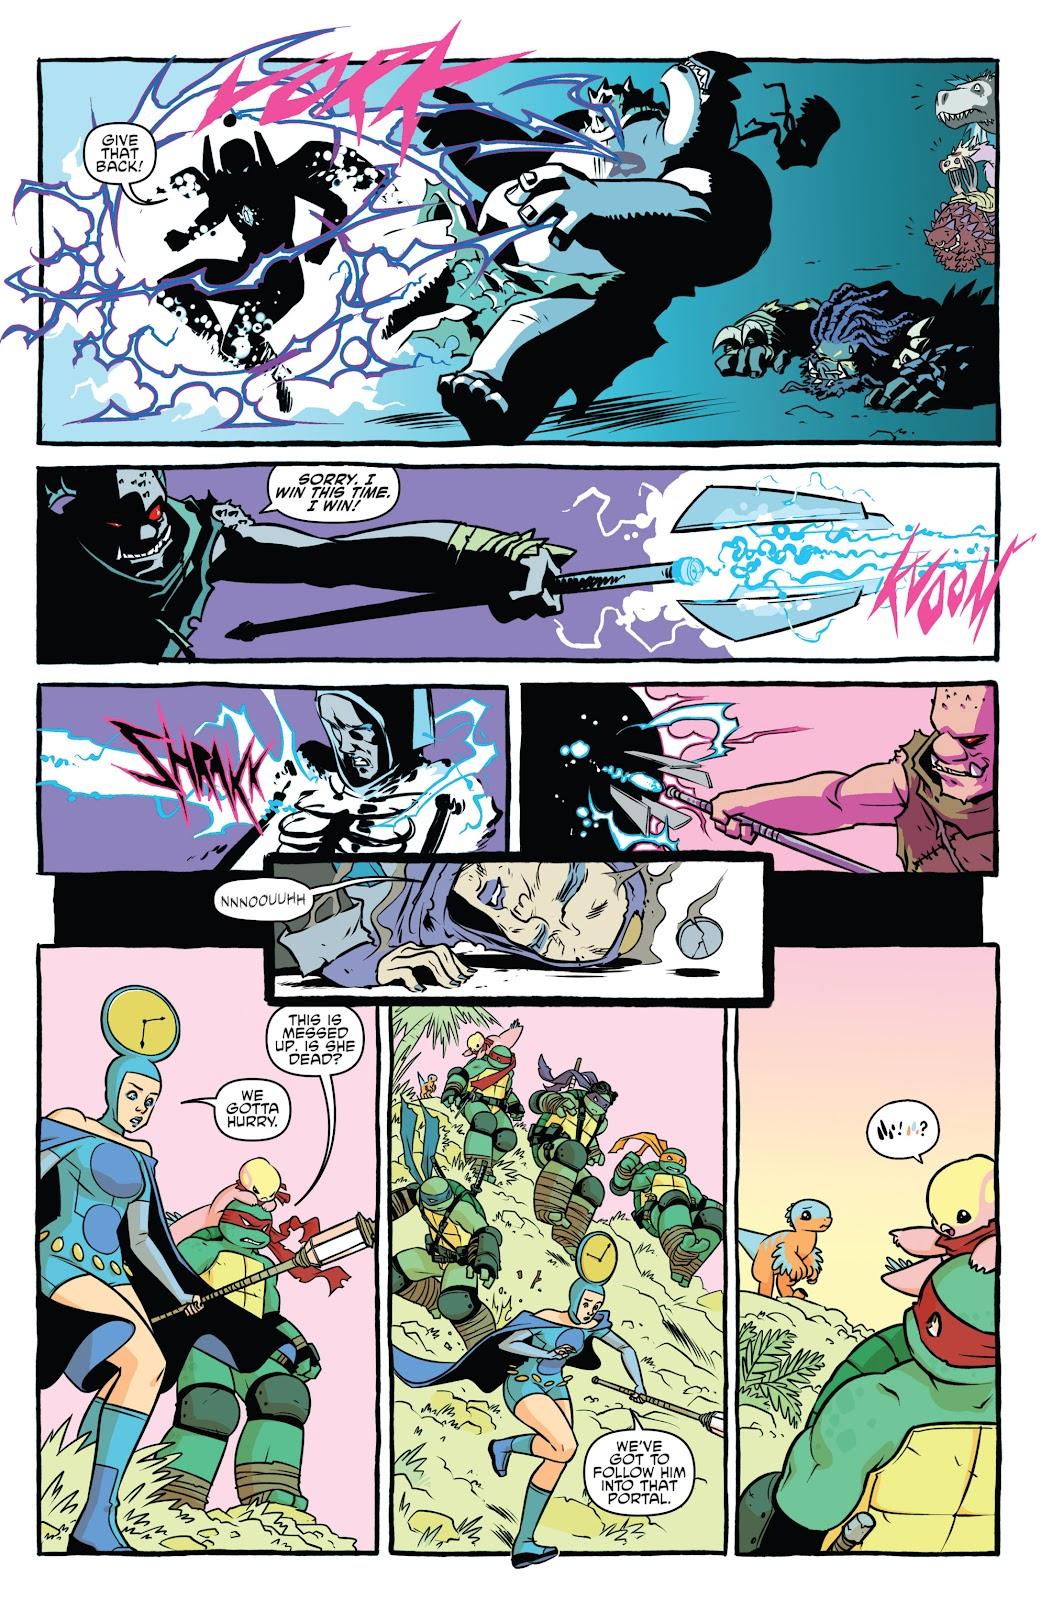 Comic Teenage Mutant Ninja Turtles Bebop & Rocksteady Destroy